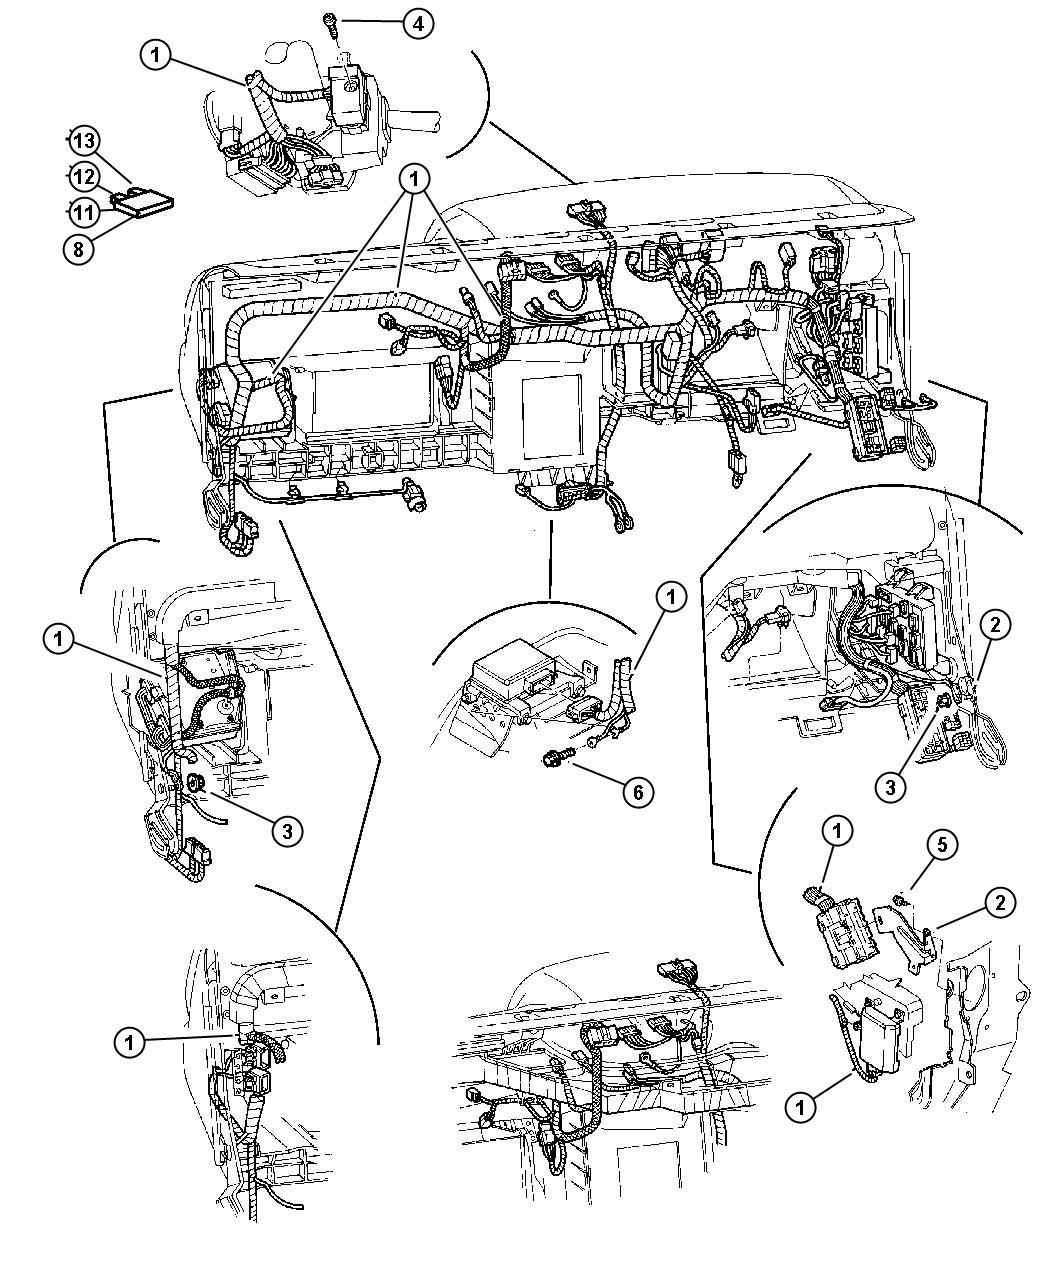 Jeep Liberty Breaker Circuit